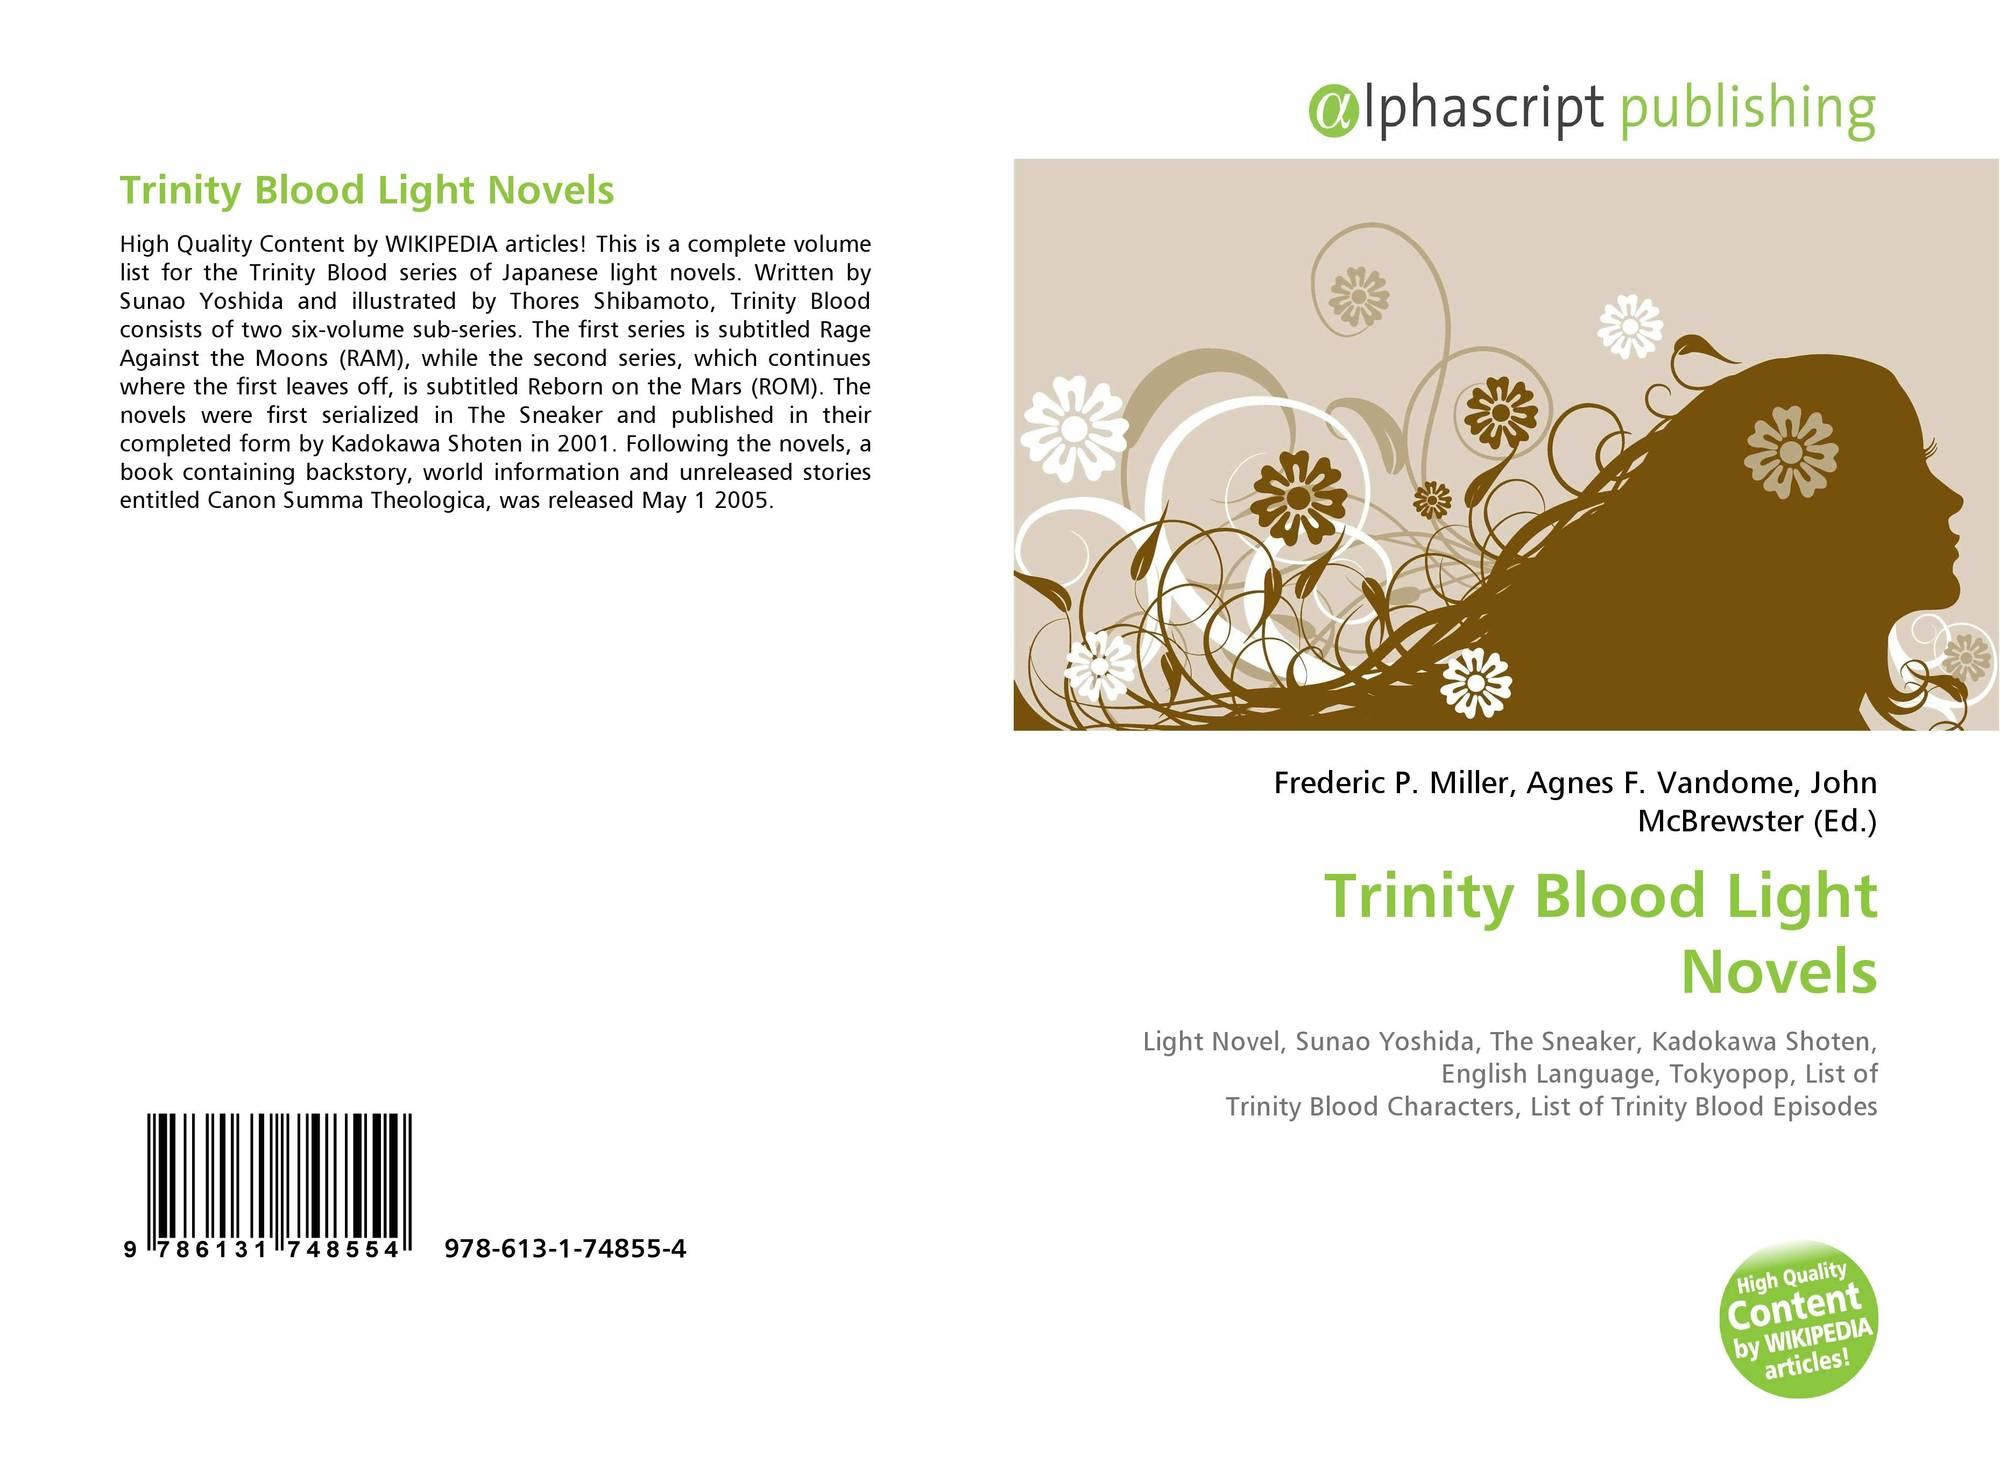 Trinity Blood Light Novels, 978-613-1-74855-4, 6131748551